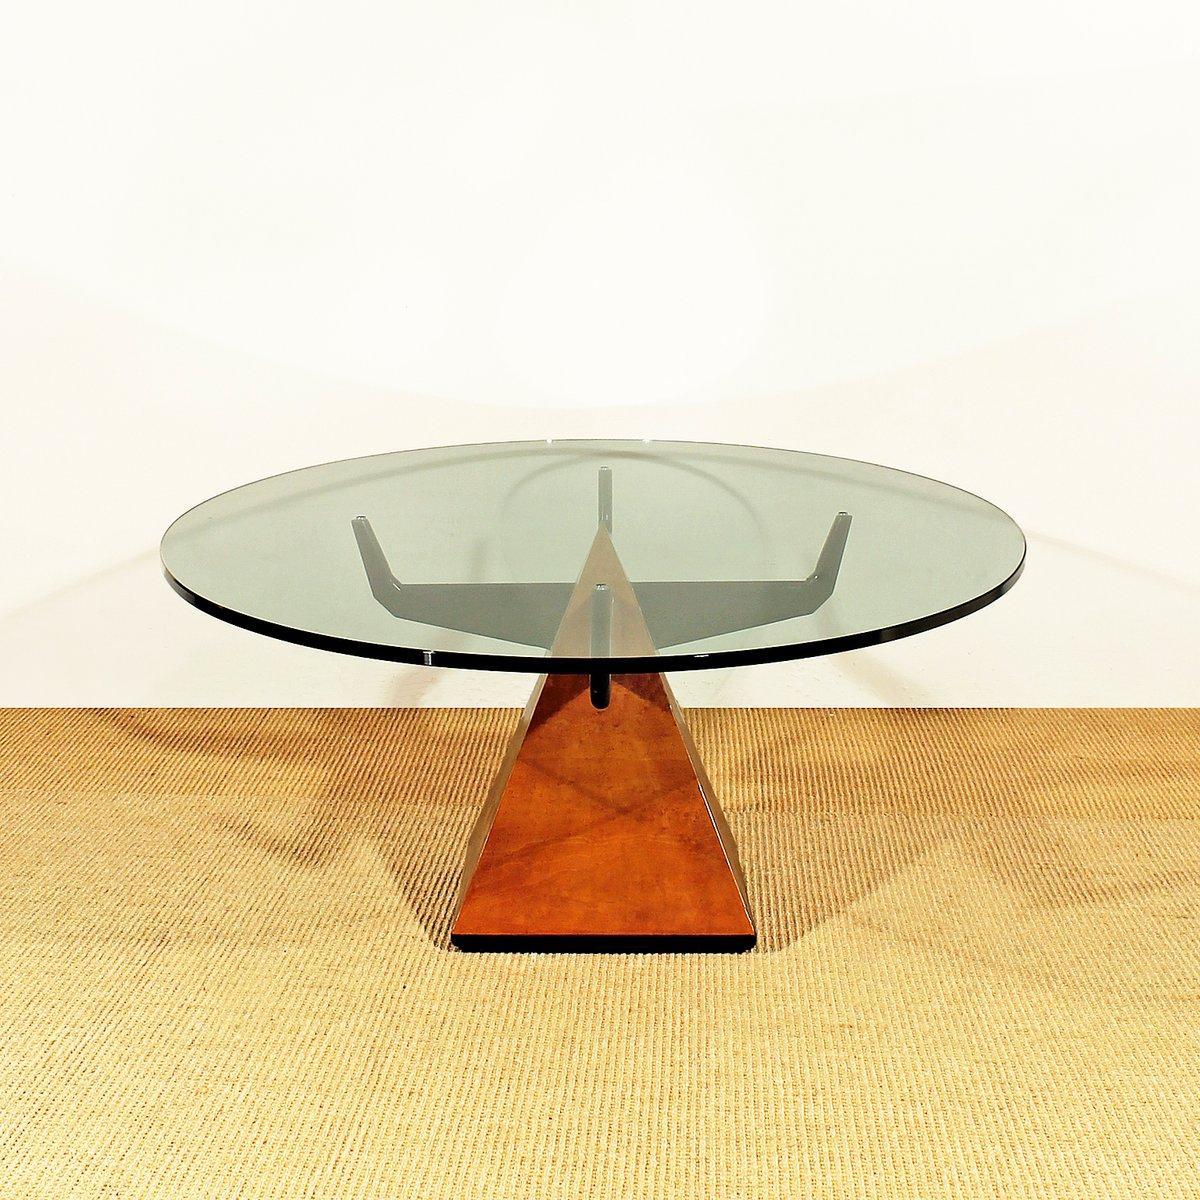 Italian Coffee Table Pyramidal Italian Coffee Table 1950s For Sale At Pamono